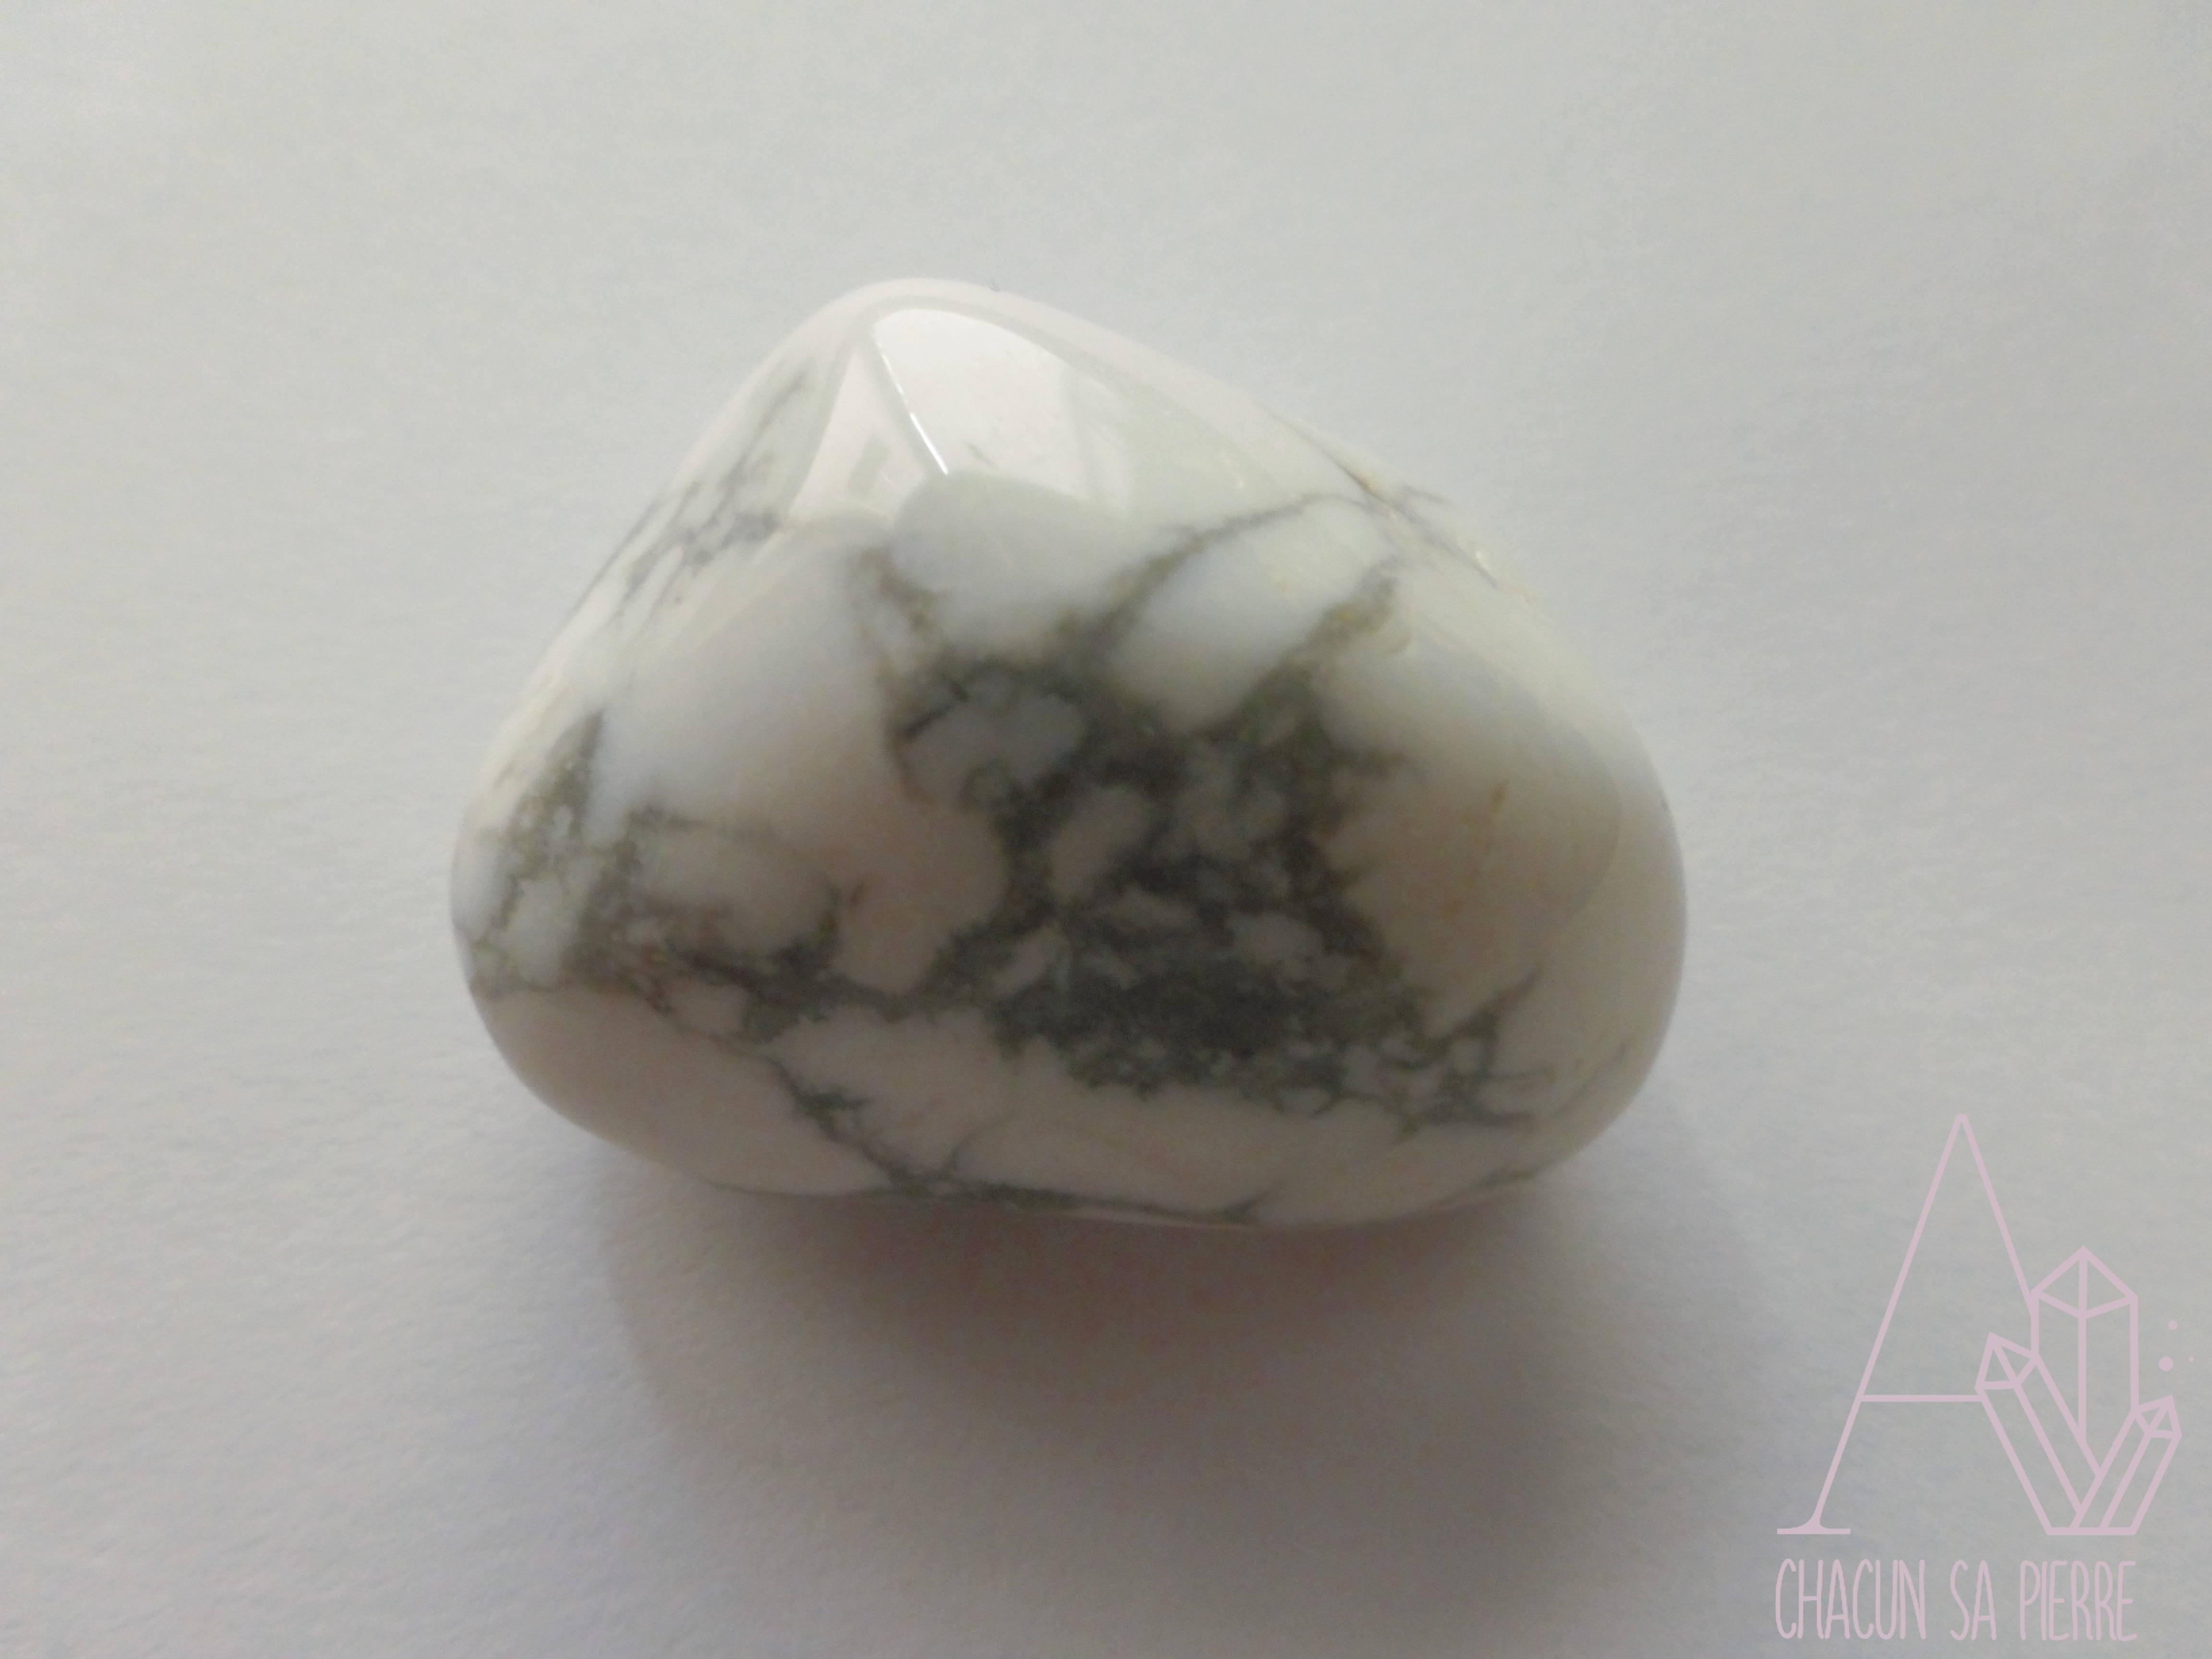 Howlite pierre roulée – A Chacun sa Pierre